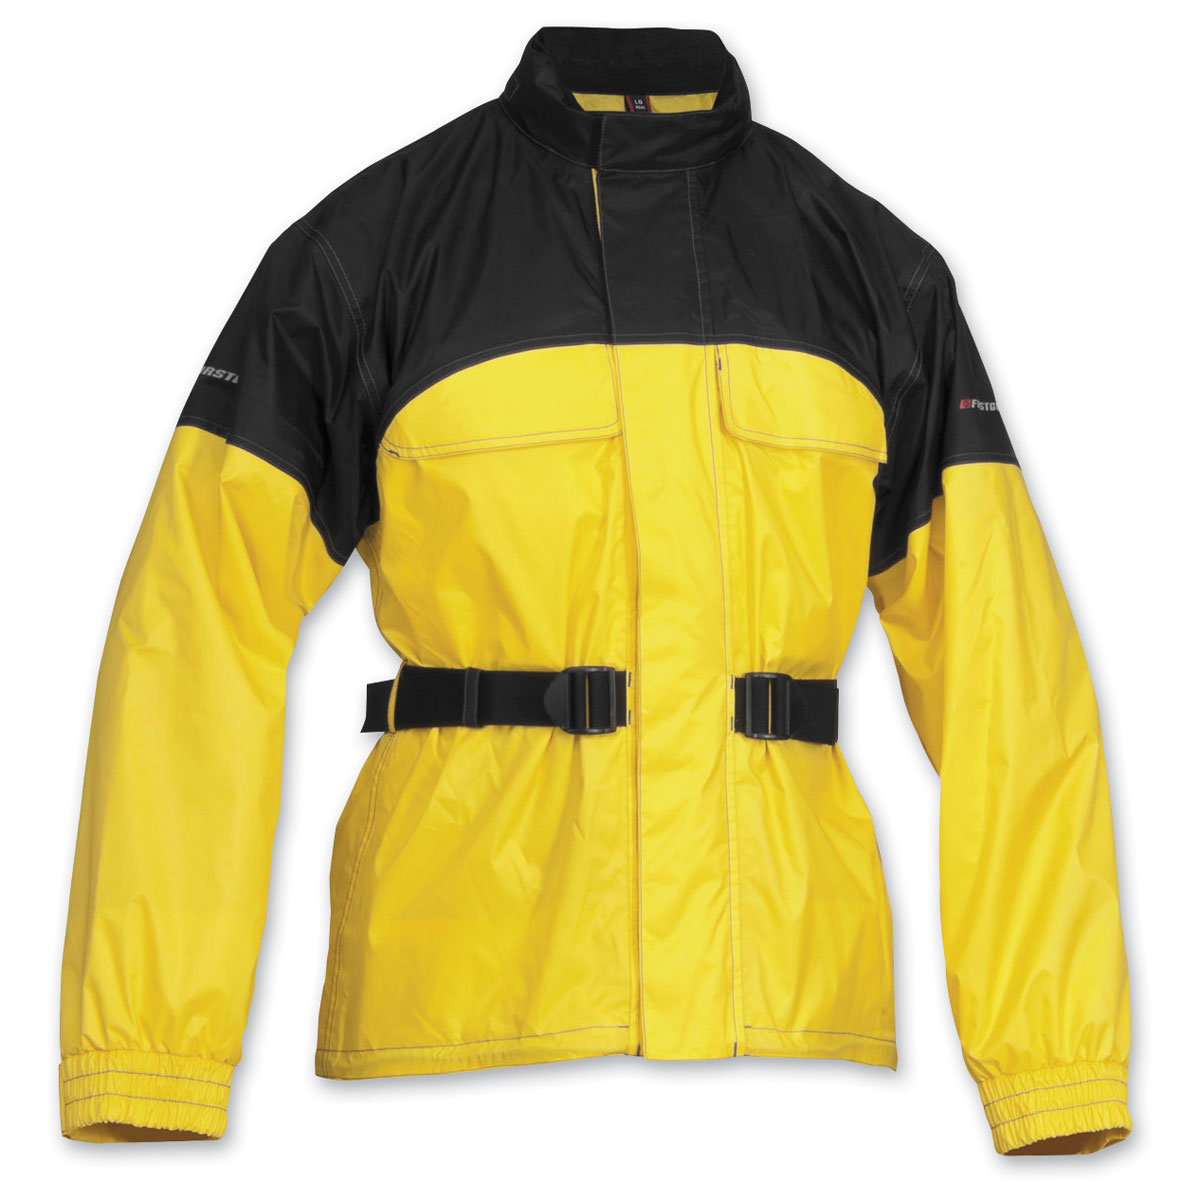 Firstgear Men's Rainman Black/Yellow Rain Jacket